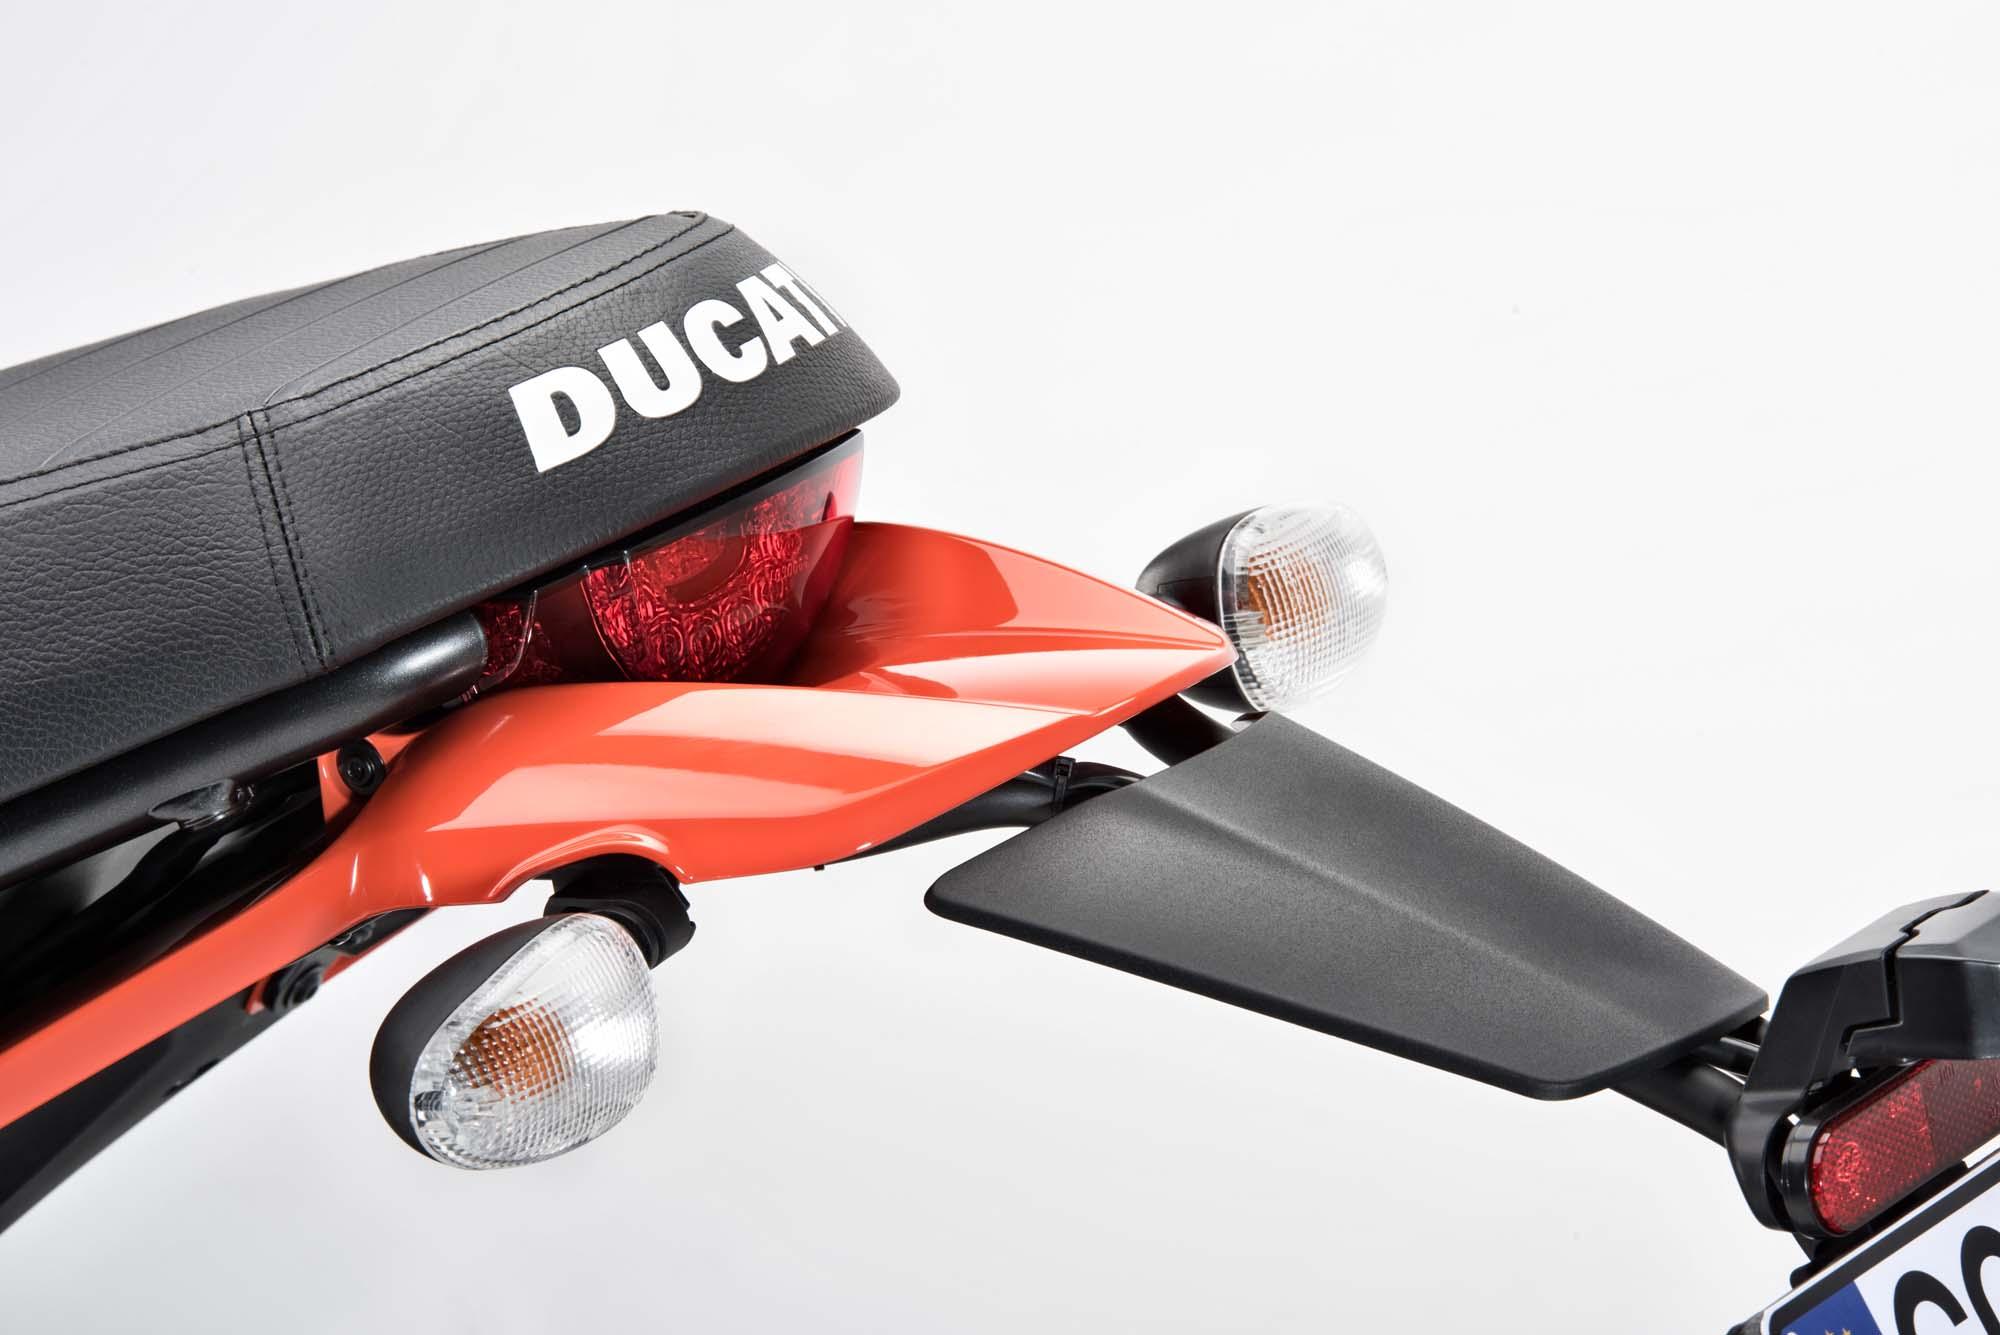 МОТОЦИКЛ DUCATI SCRAMBLER SIXTY2 ― Артмото - купить квадроцикл в украине и харькове, мотоцикл, снегоход, скутер, мопед, электромобиль